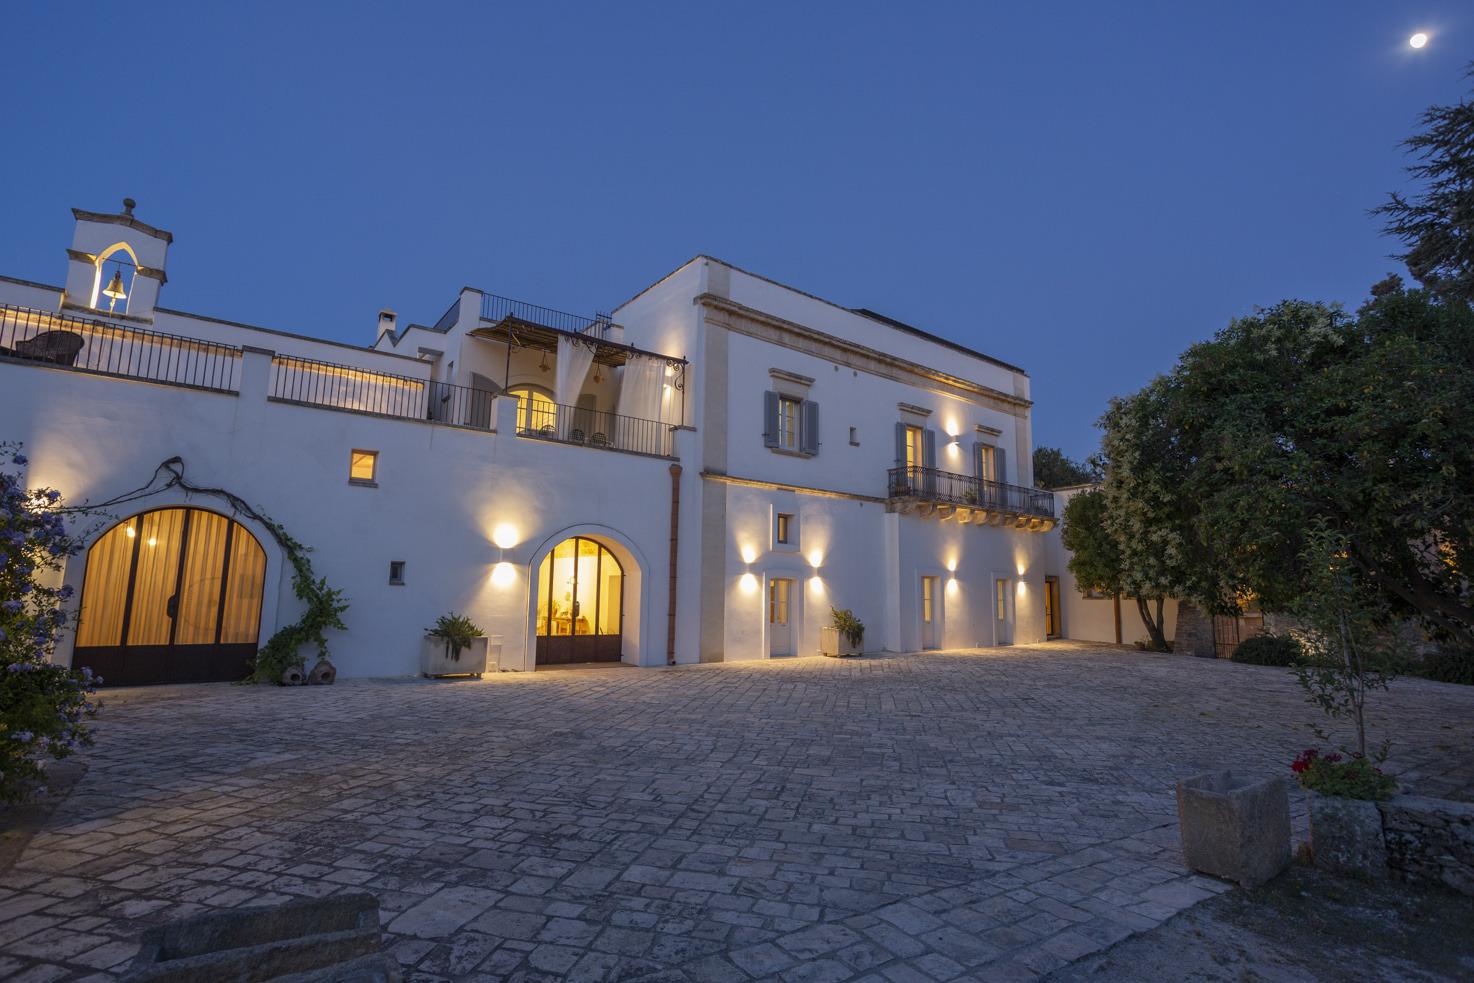 The Masseria by night